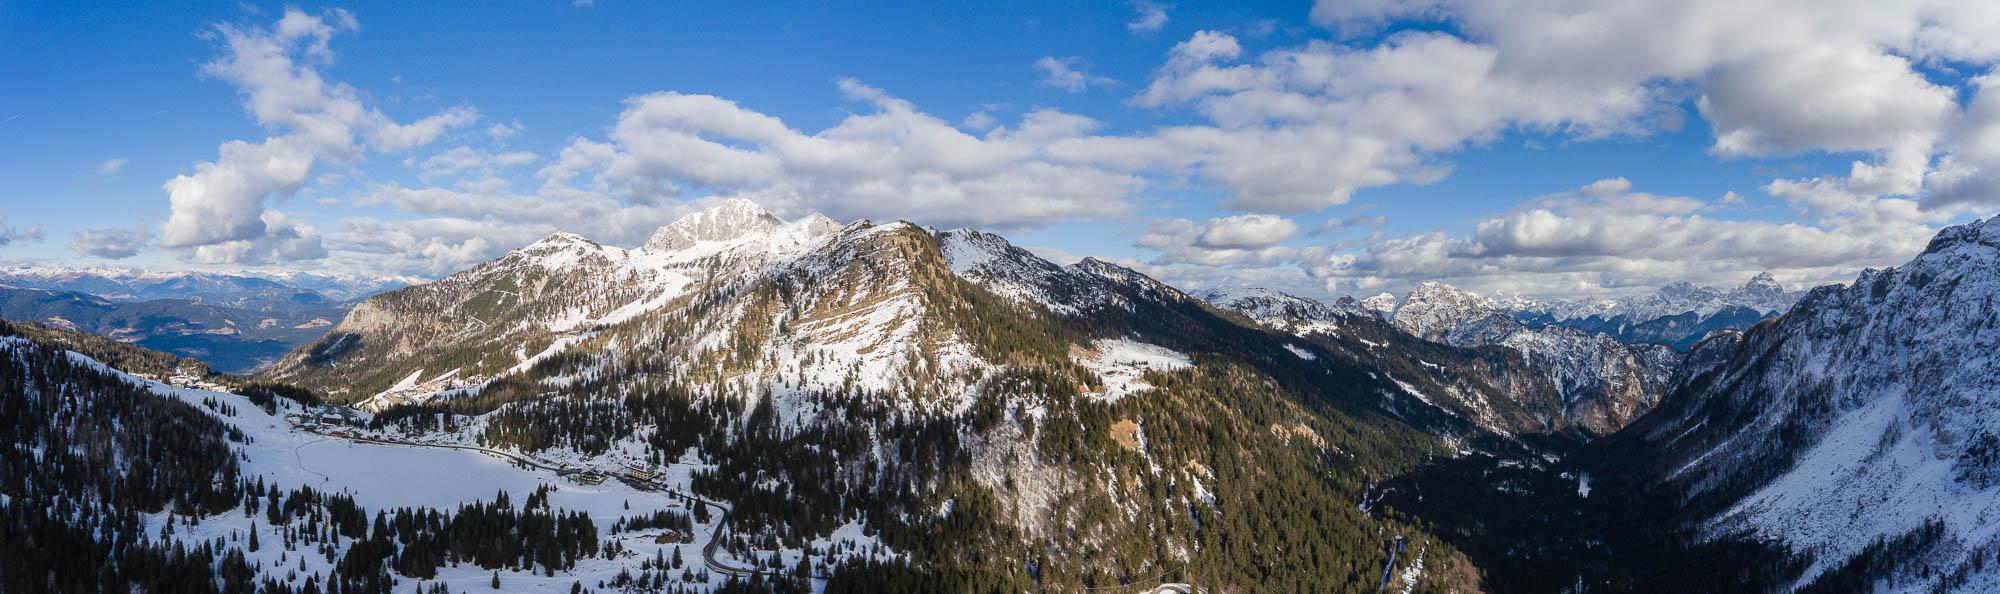 Nassfeld Panorama - www.jusmedic.com